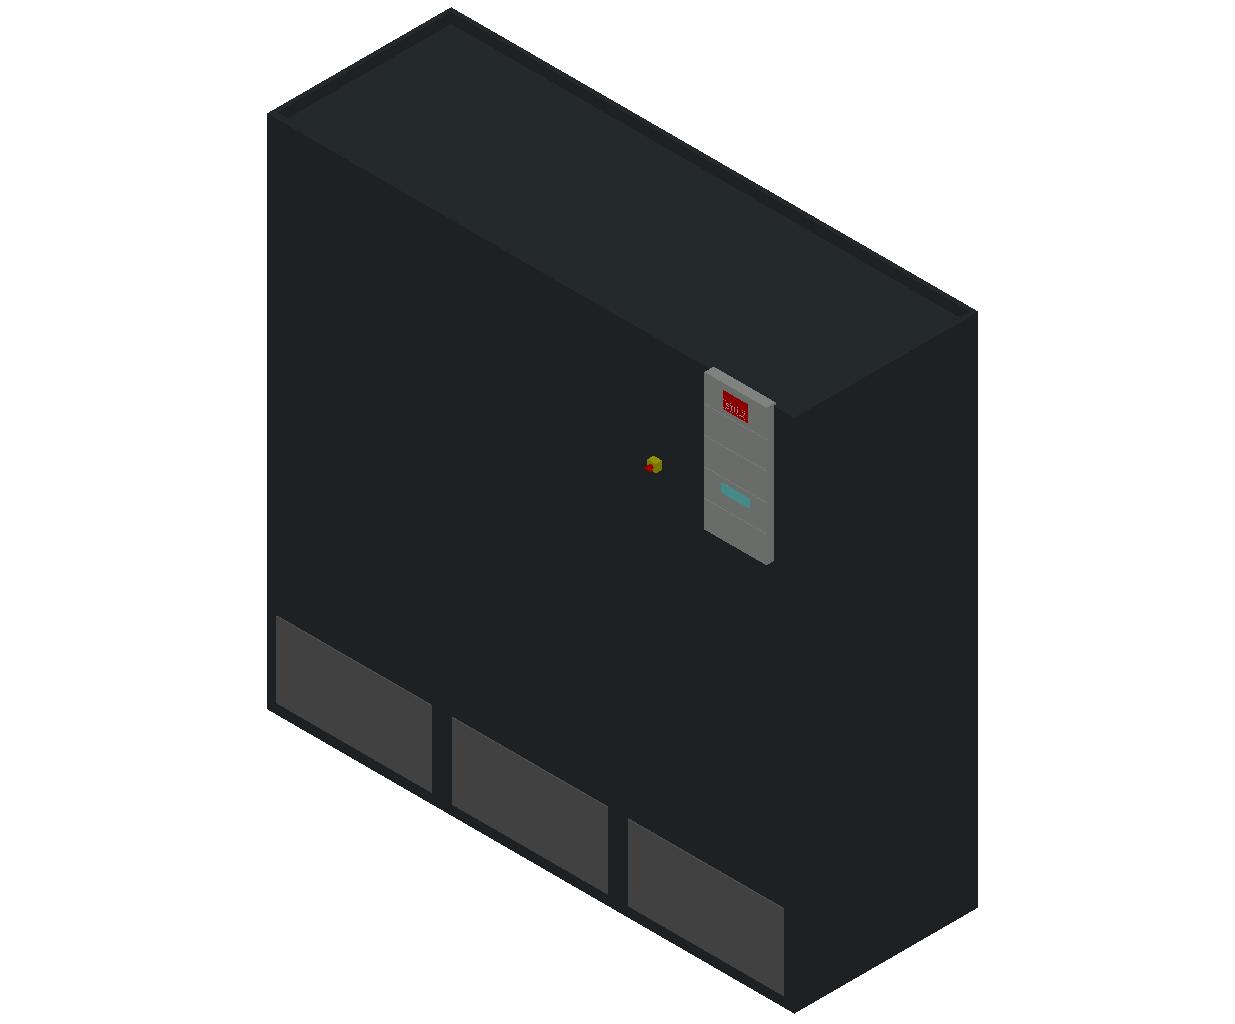 HC_Air Conditioner_Indoor Unit_MEPcontent_STULZ_CyberAir 3PRO_ASR_Dual Circuit A_ASR_1082_A_INT-EN.dwg